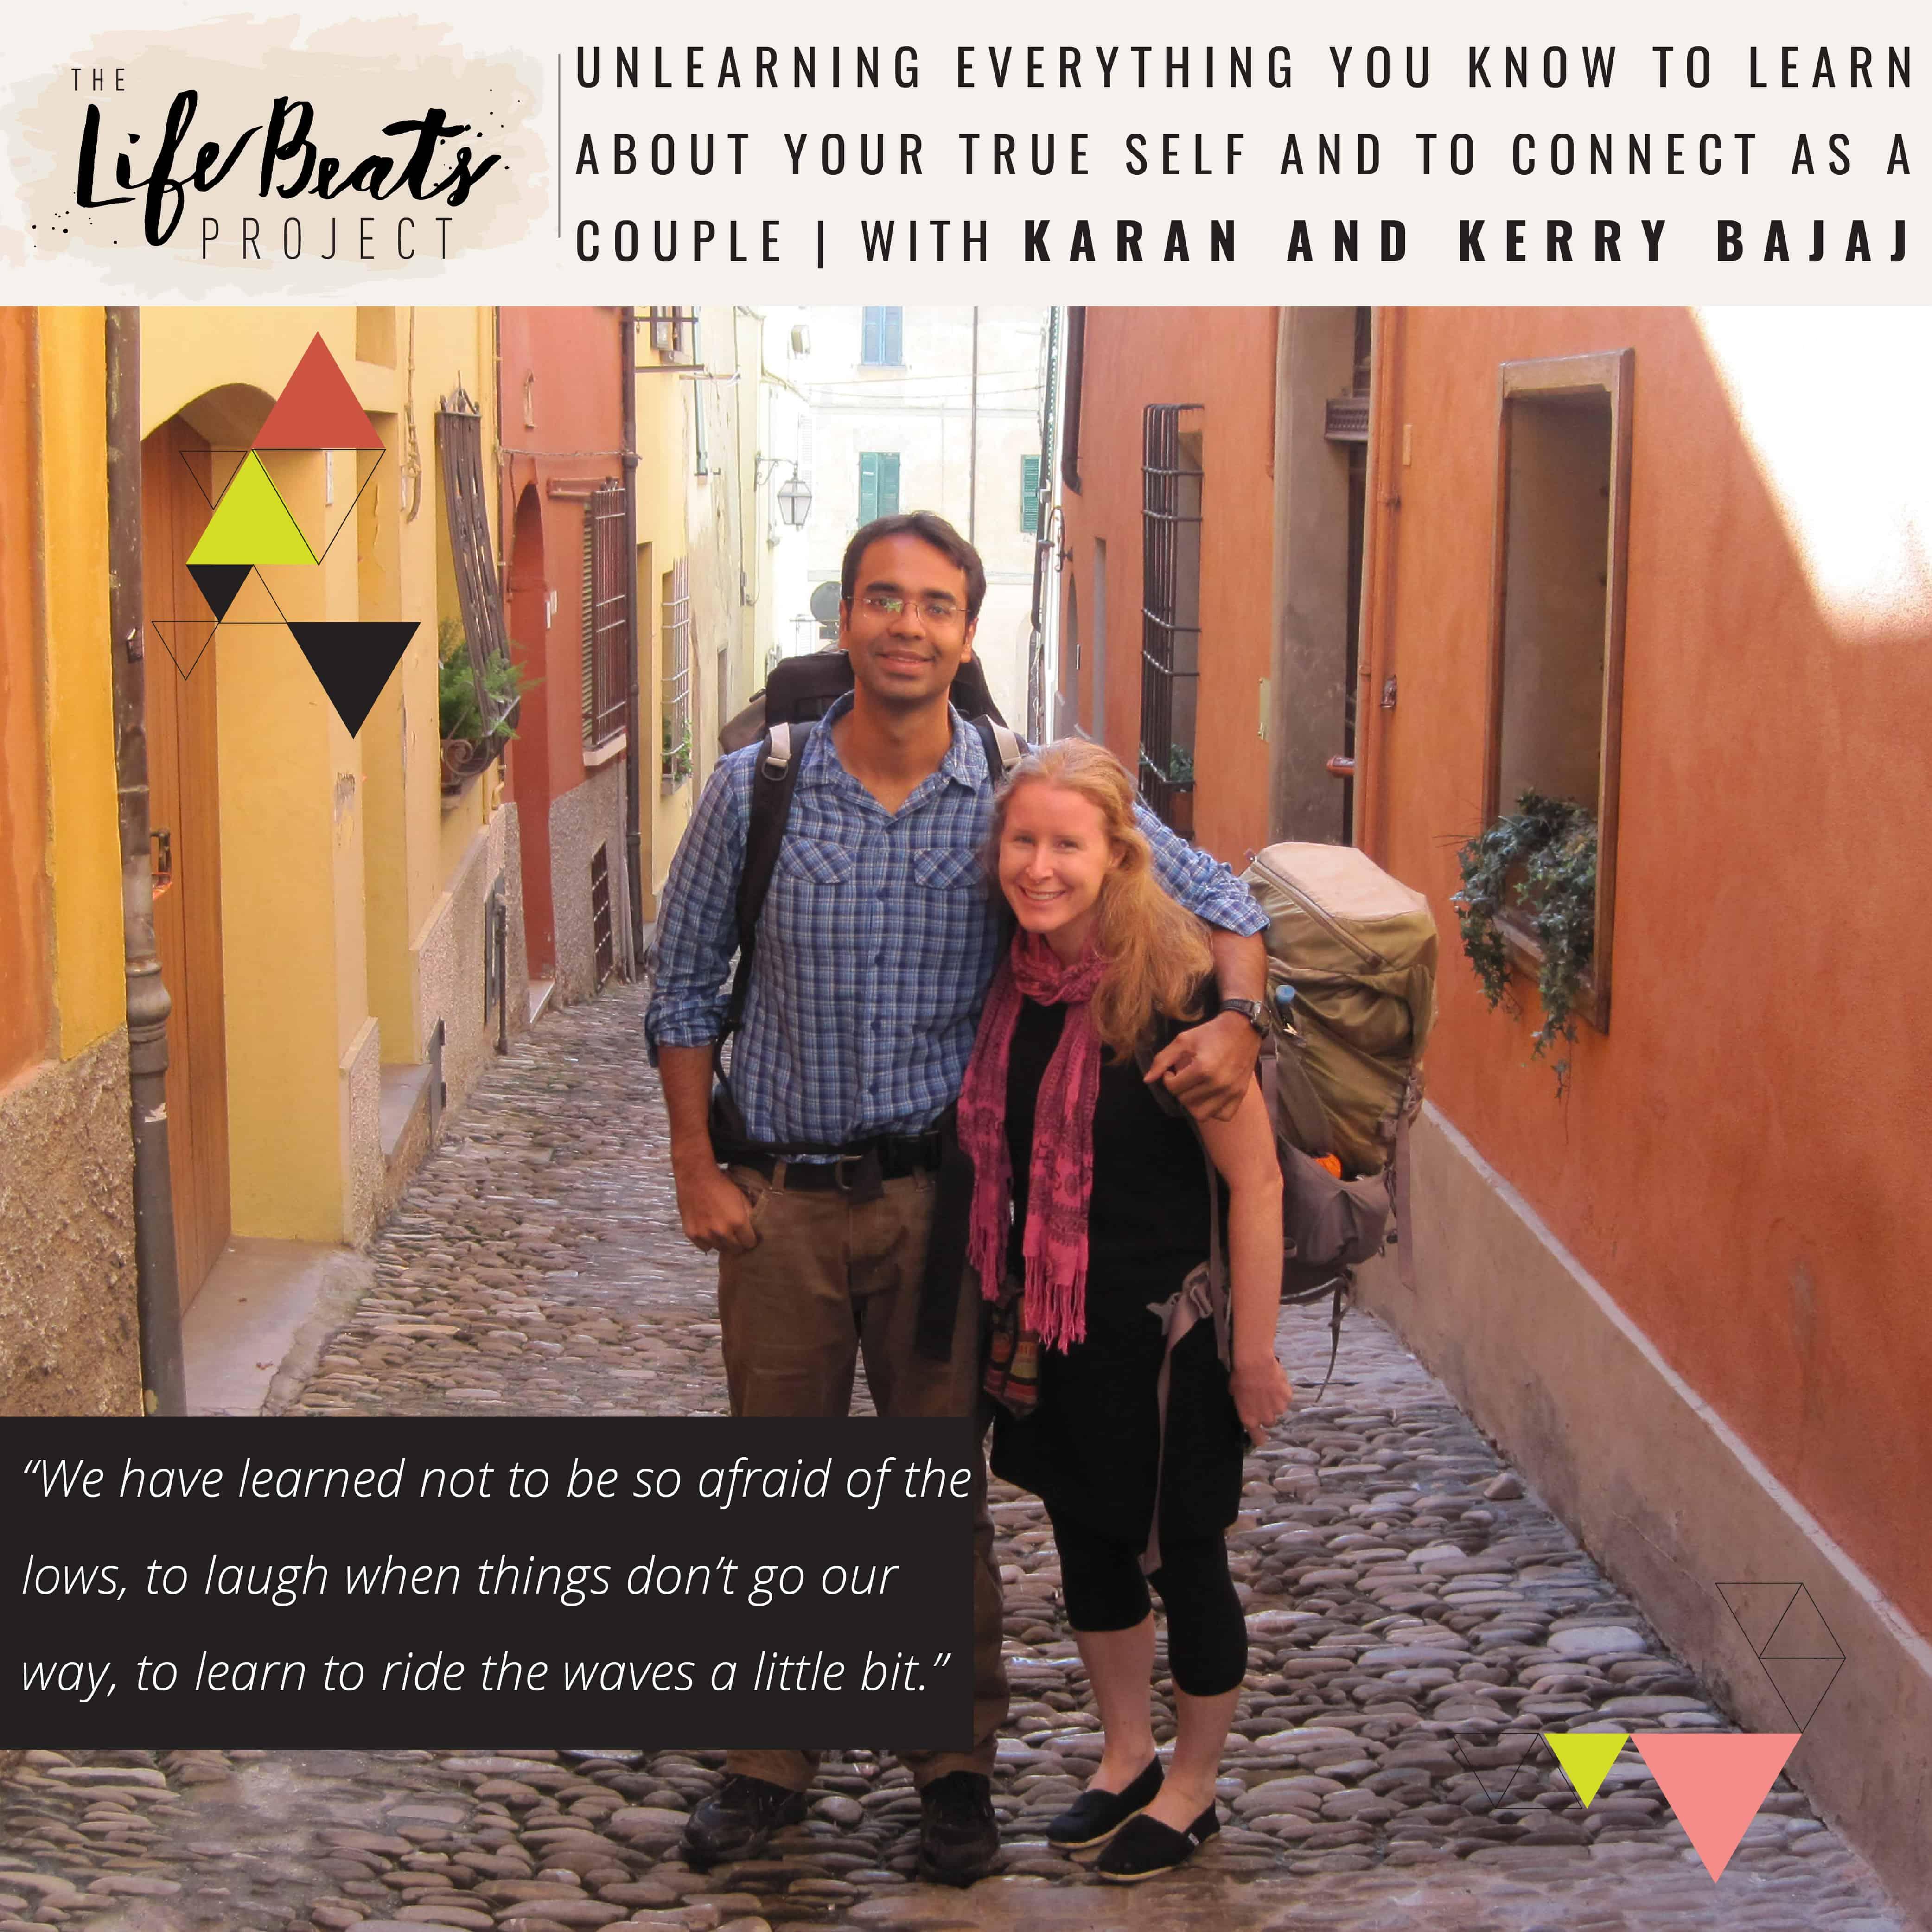 Indian novelist yoga meditation couple retreat parenting relationships podcast